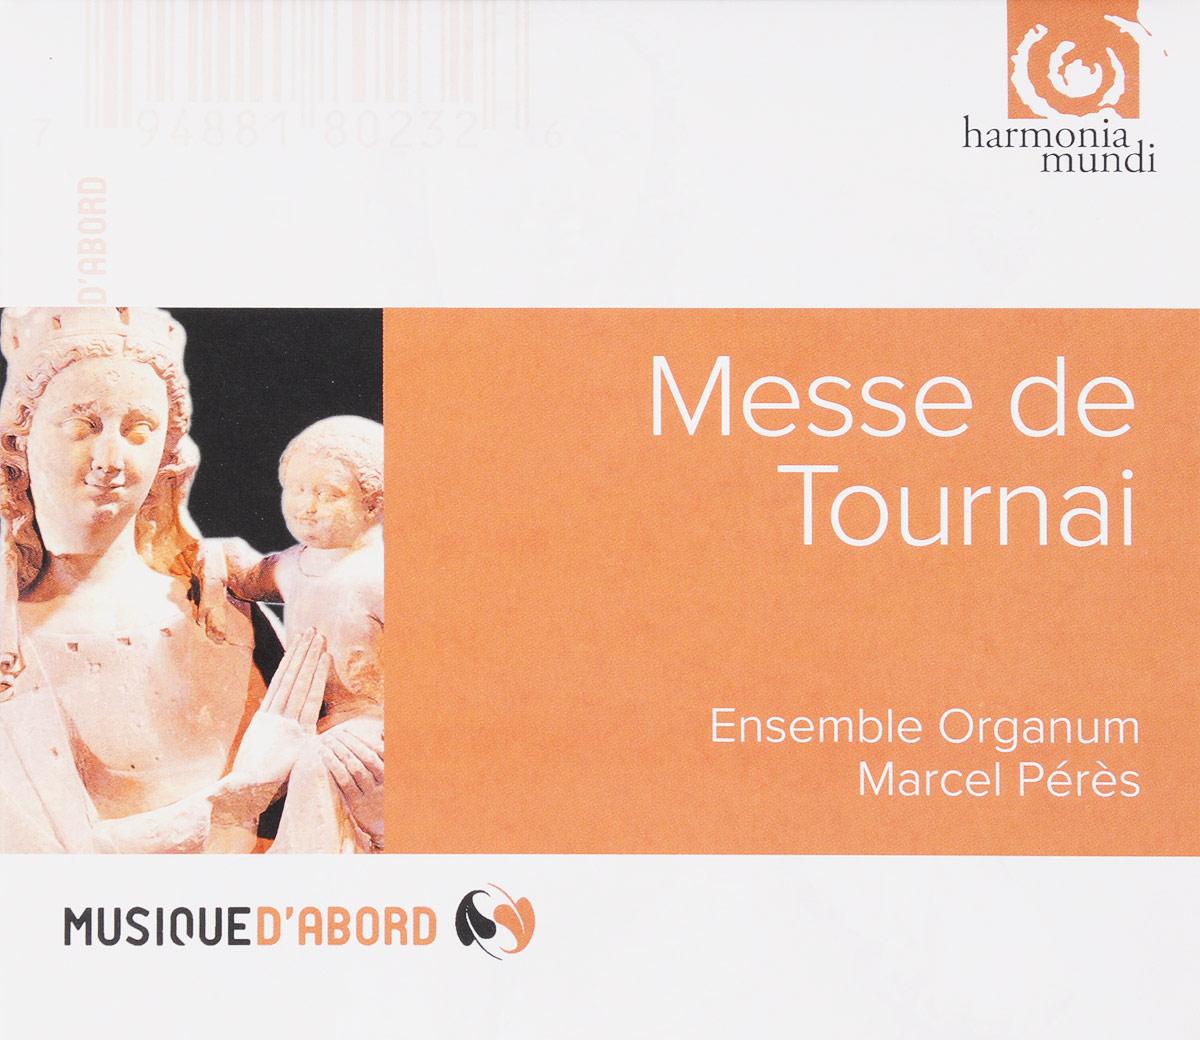 VARIOUS. MESSE DE TOURNAI/ENSEMBLE ORGANUM/MARCEL PERES. 1